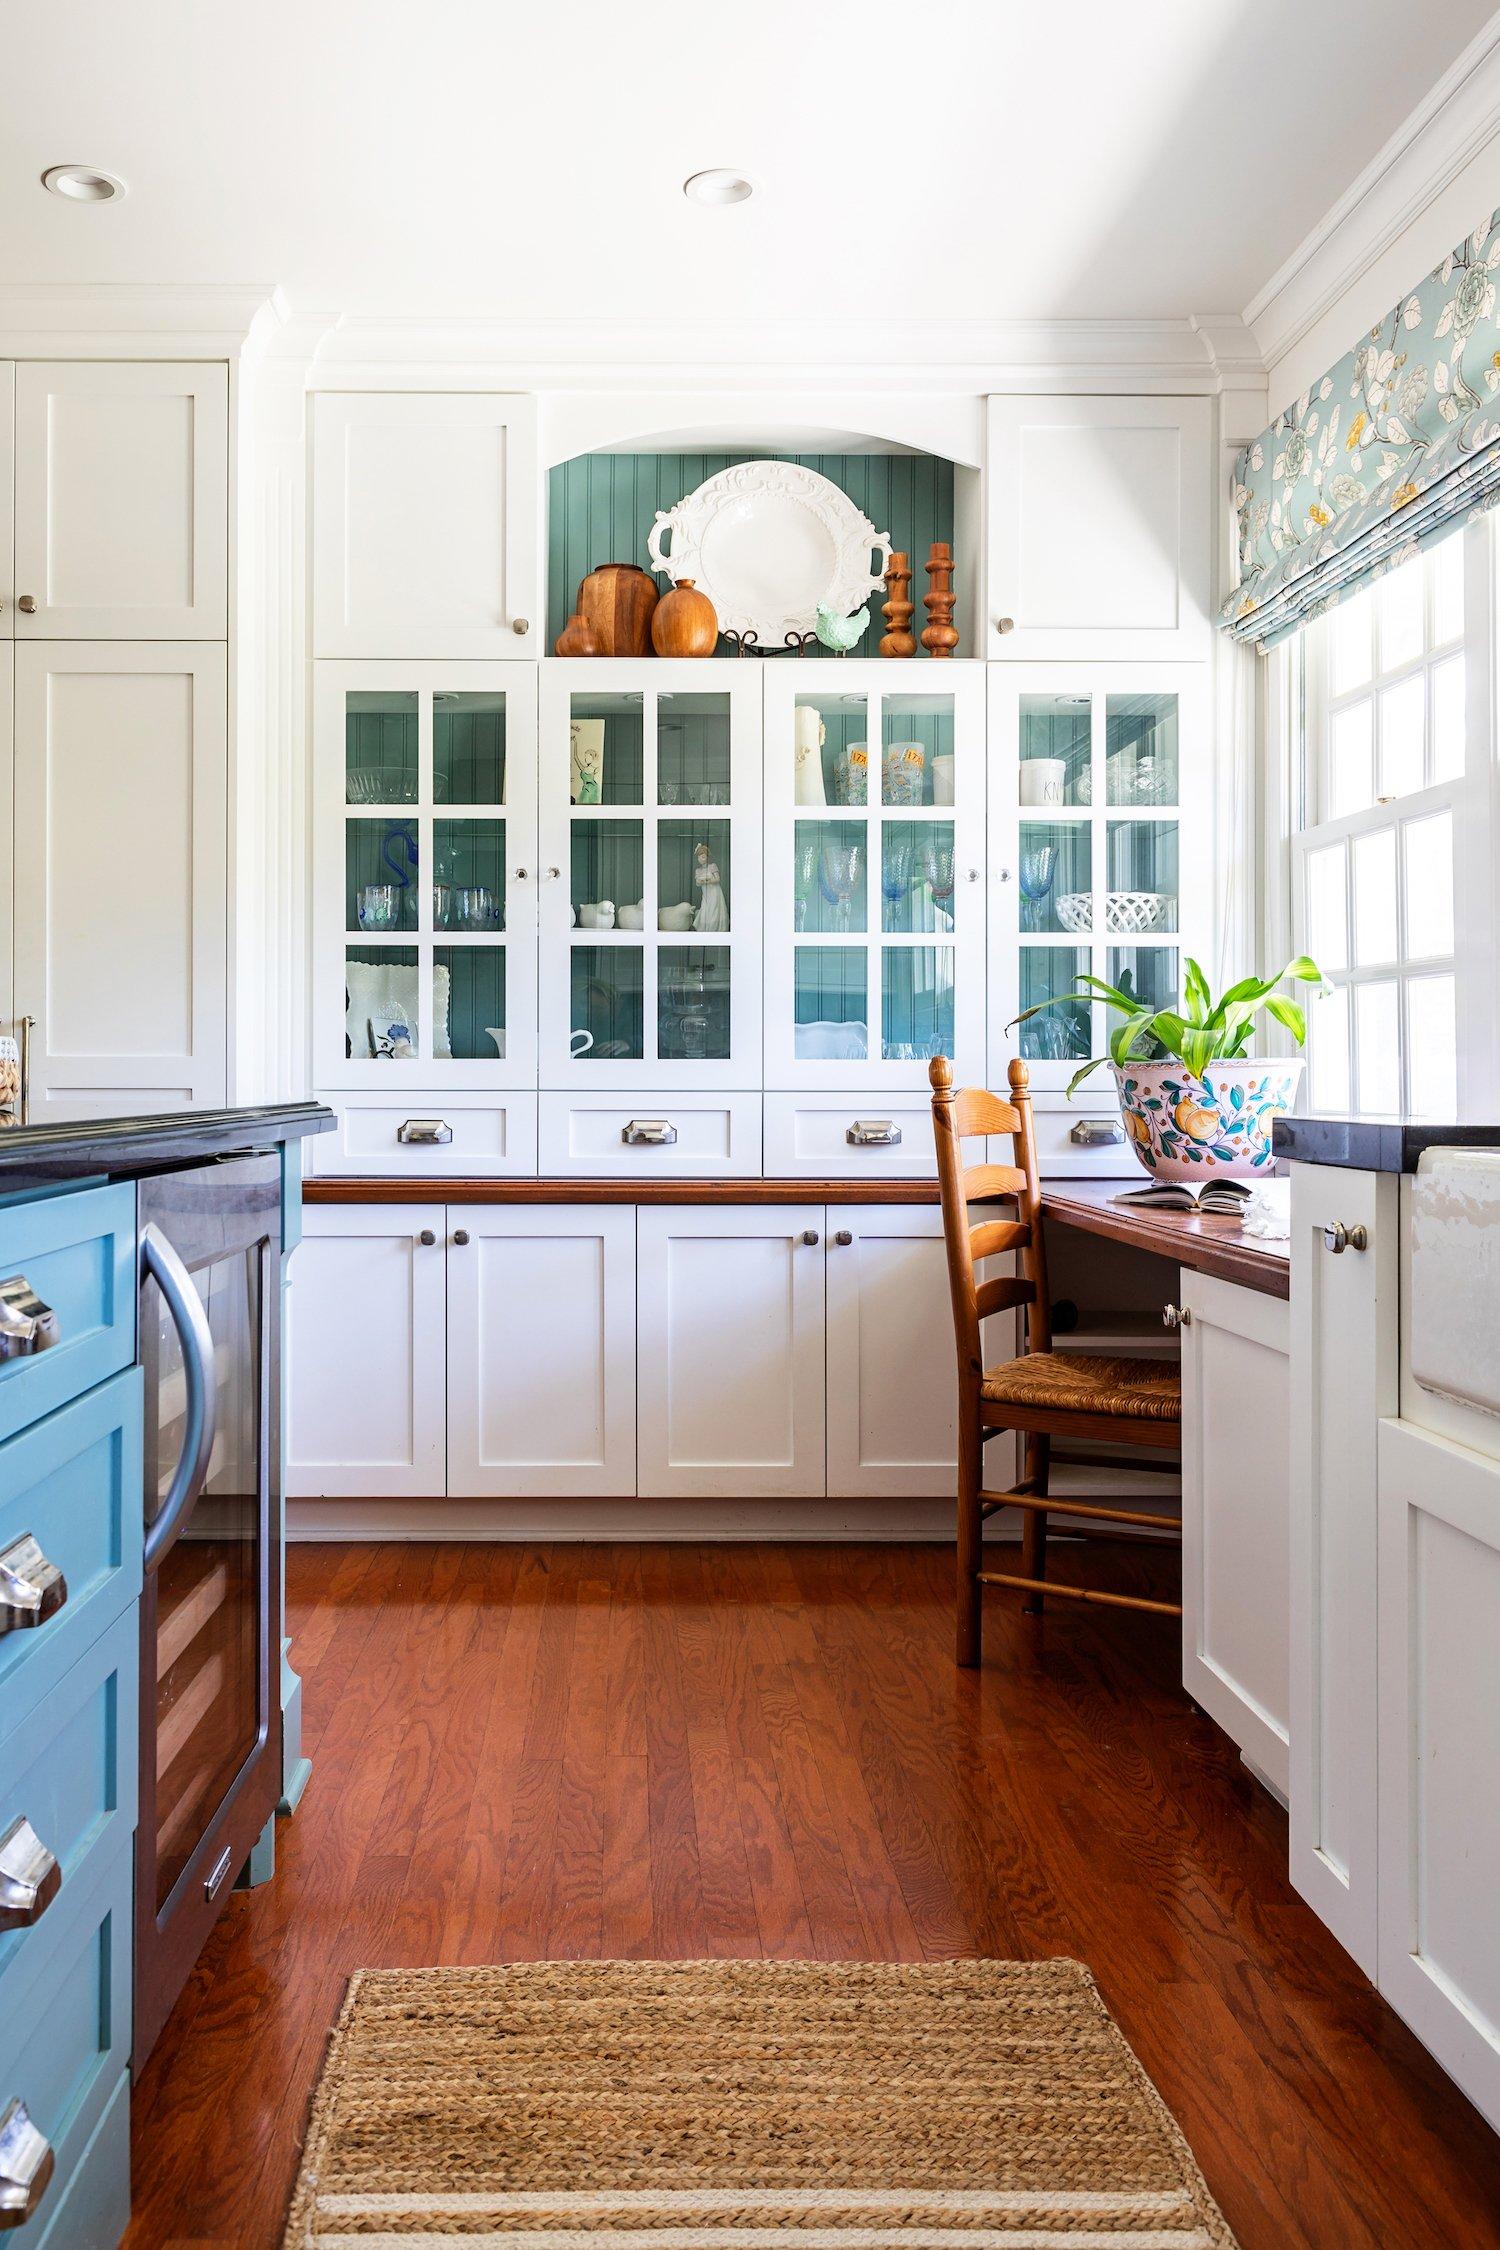 budget-friendly kitchen details - hidden kills kitchen renovation